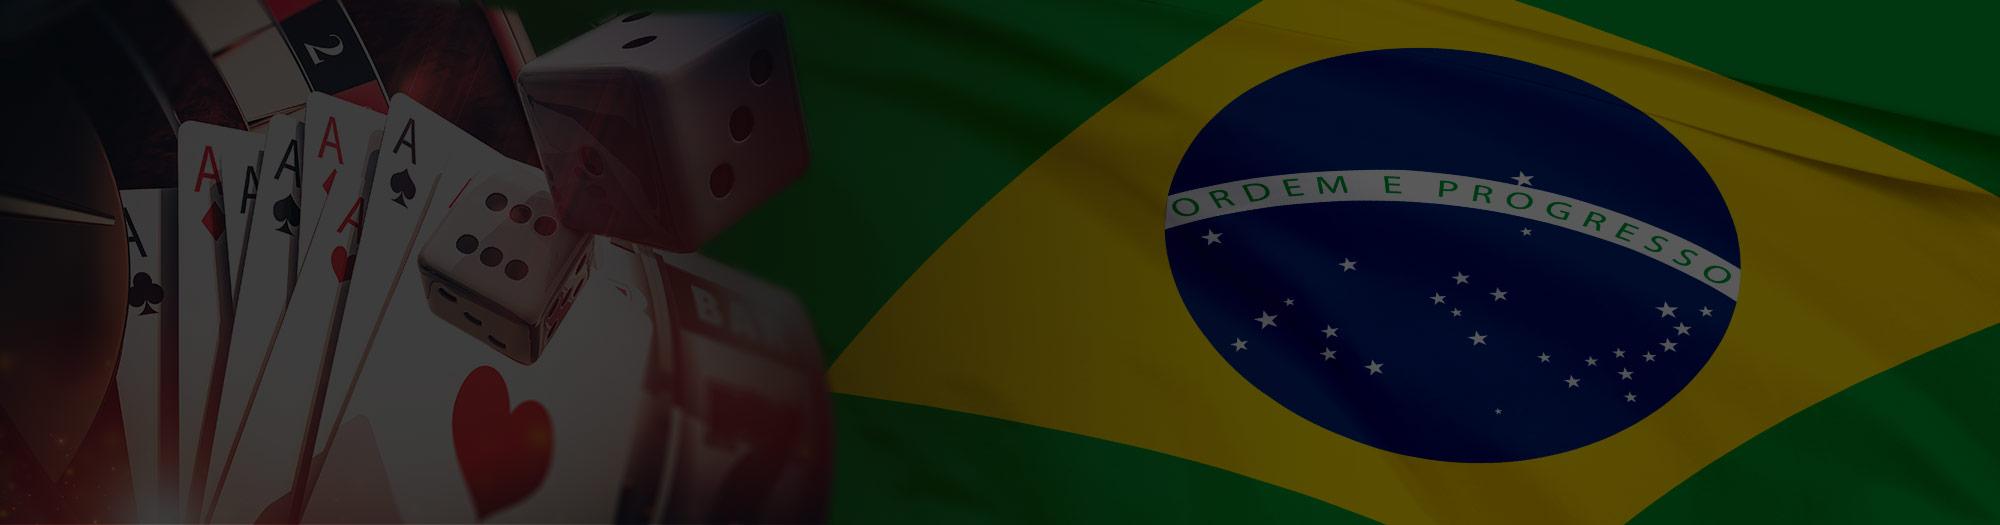 Wolverine casino Brasil melhor 20578